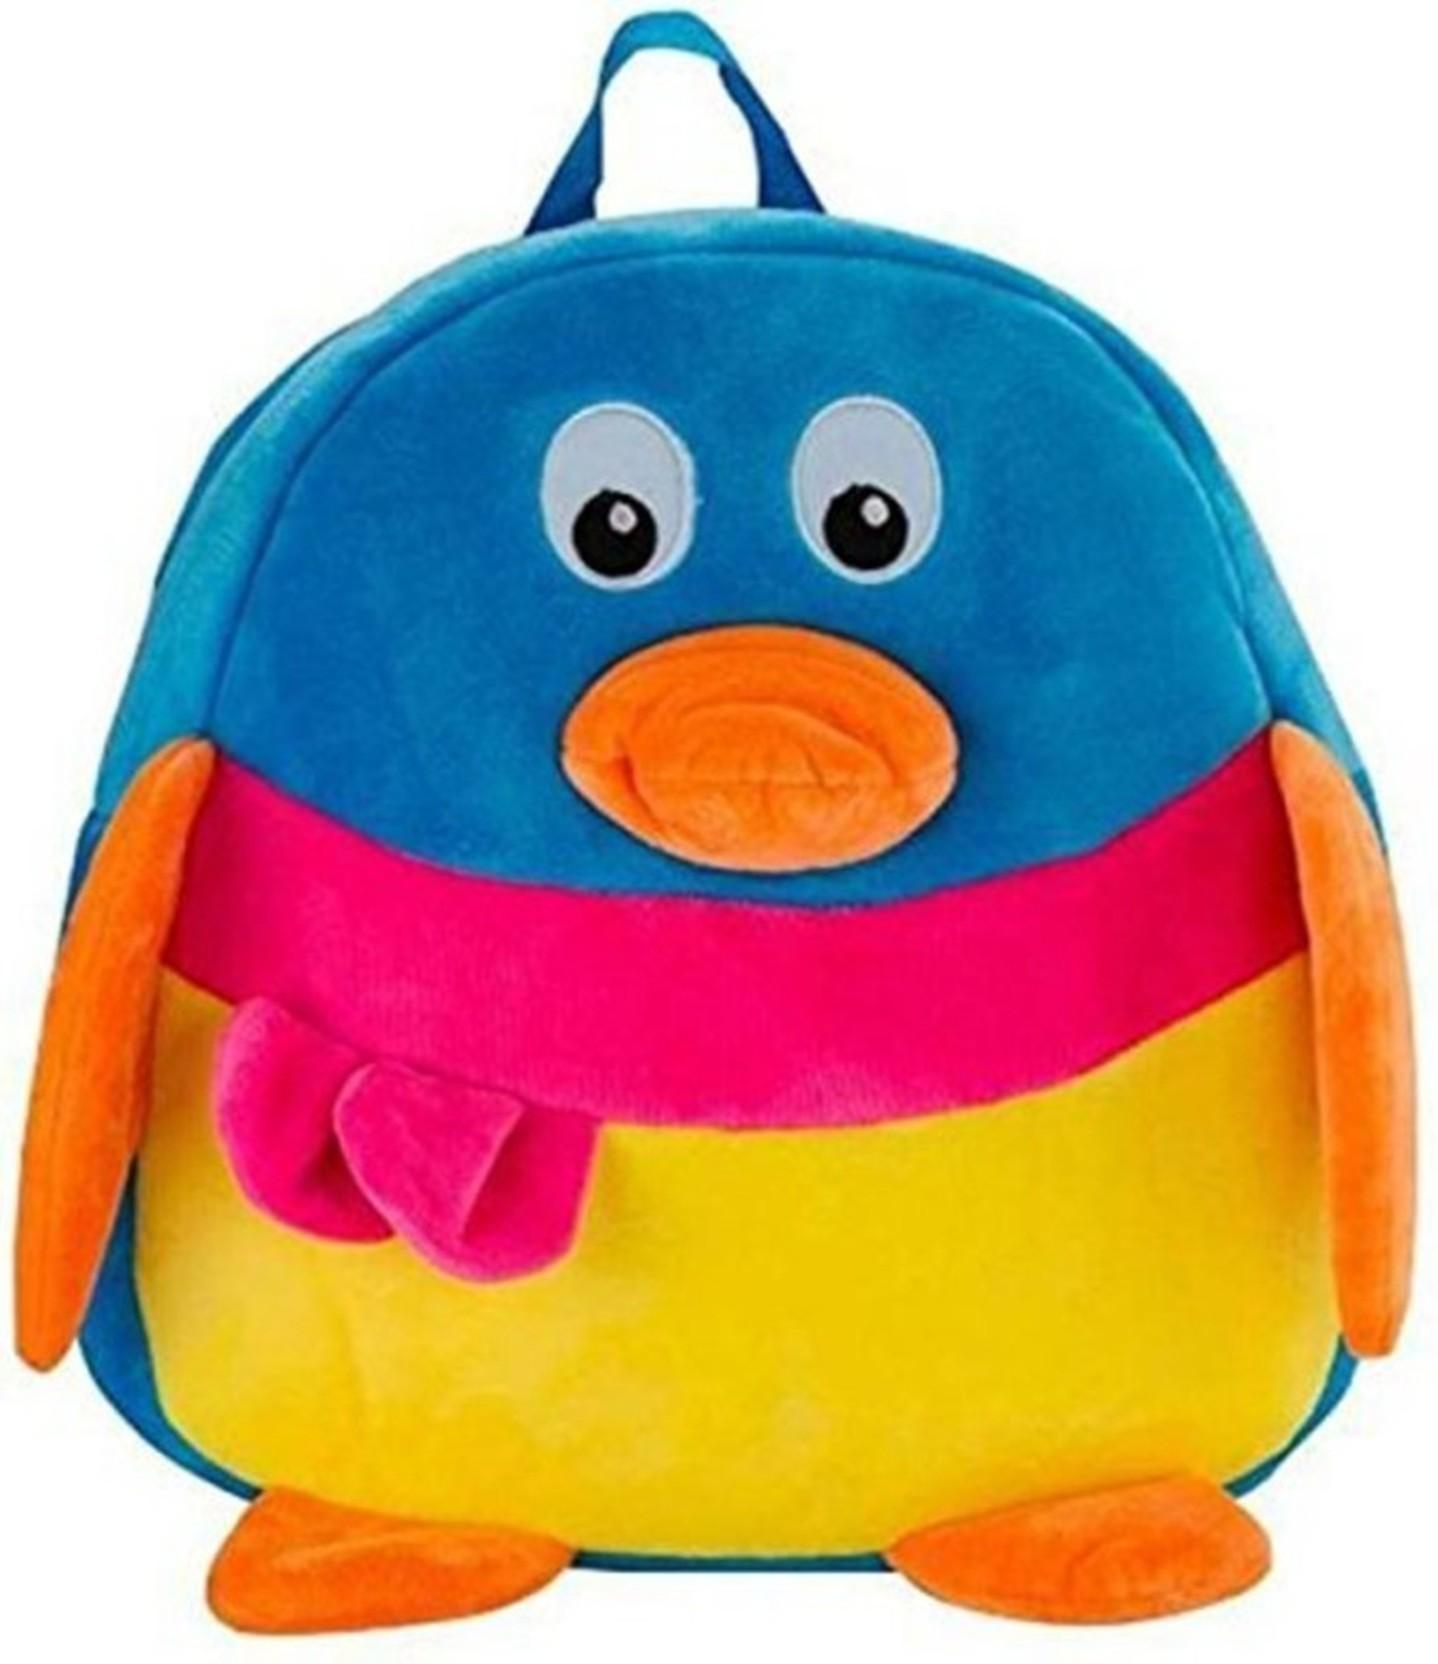 46a337640ae2 EMUTZ Kids School Bag Soft Plush Backpack Cartoon Toy